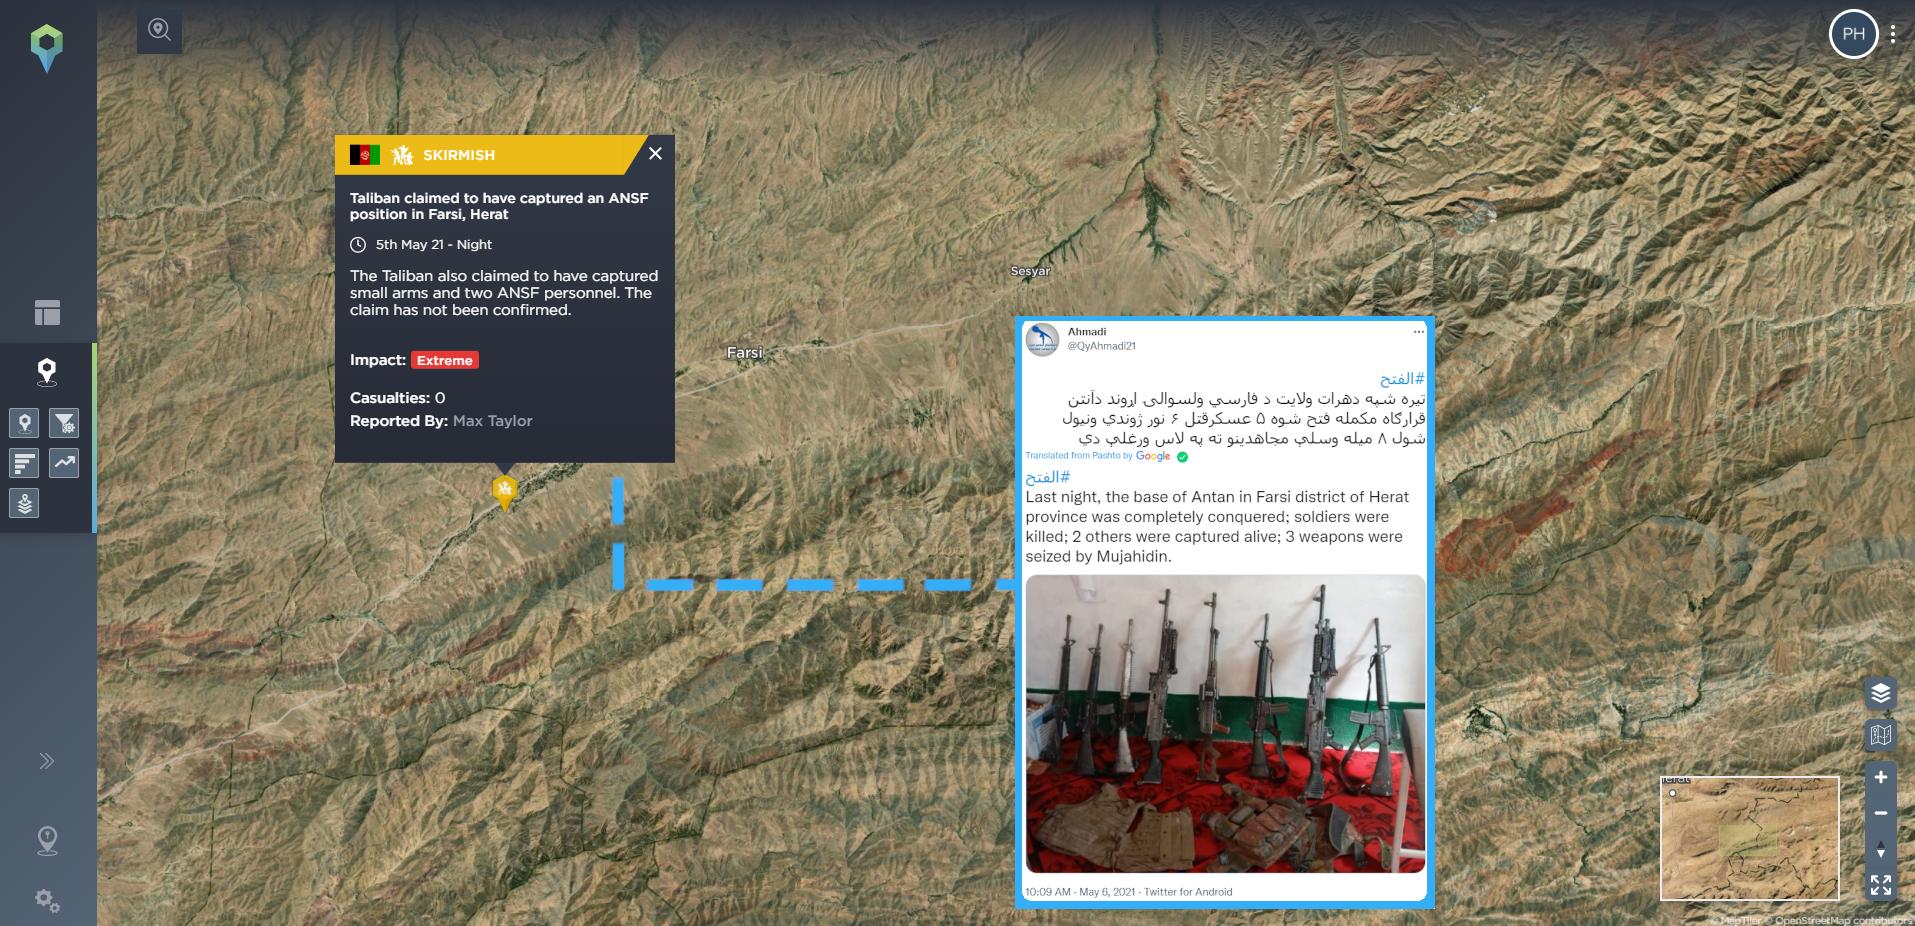 Taliban on Twitter claim capture Herat